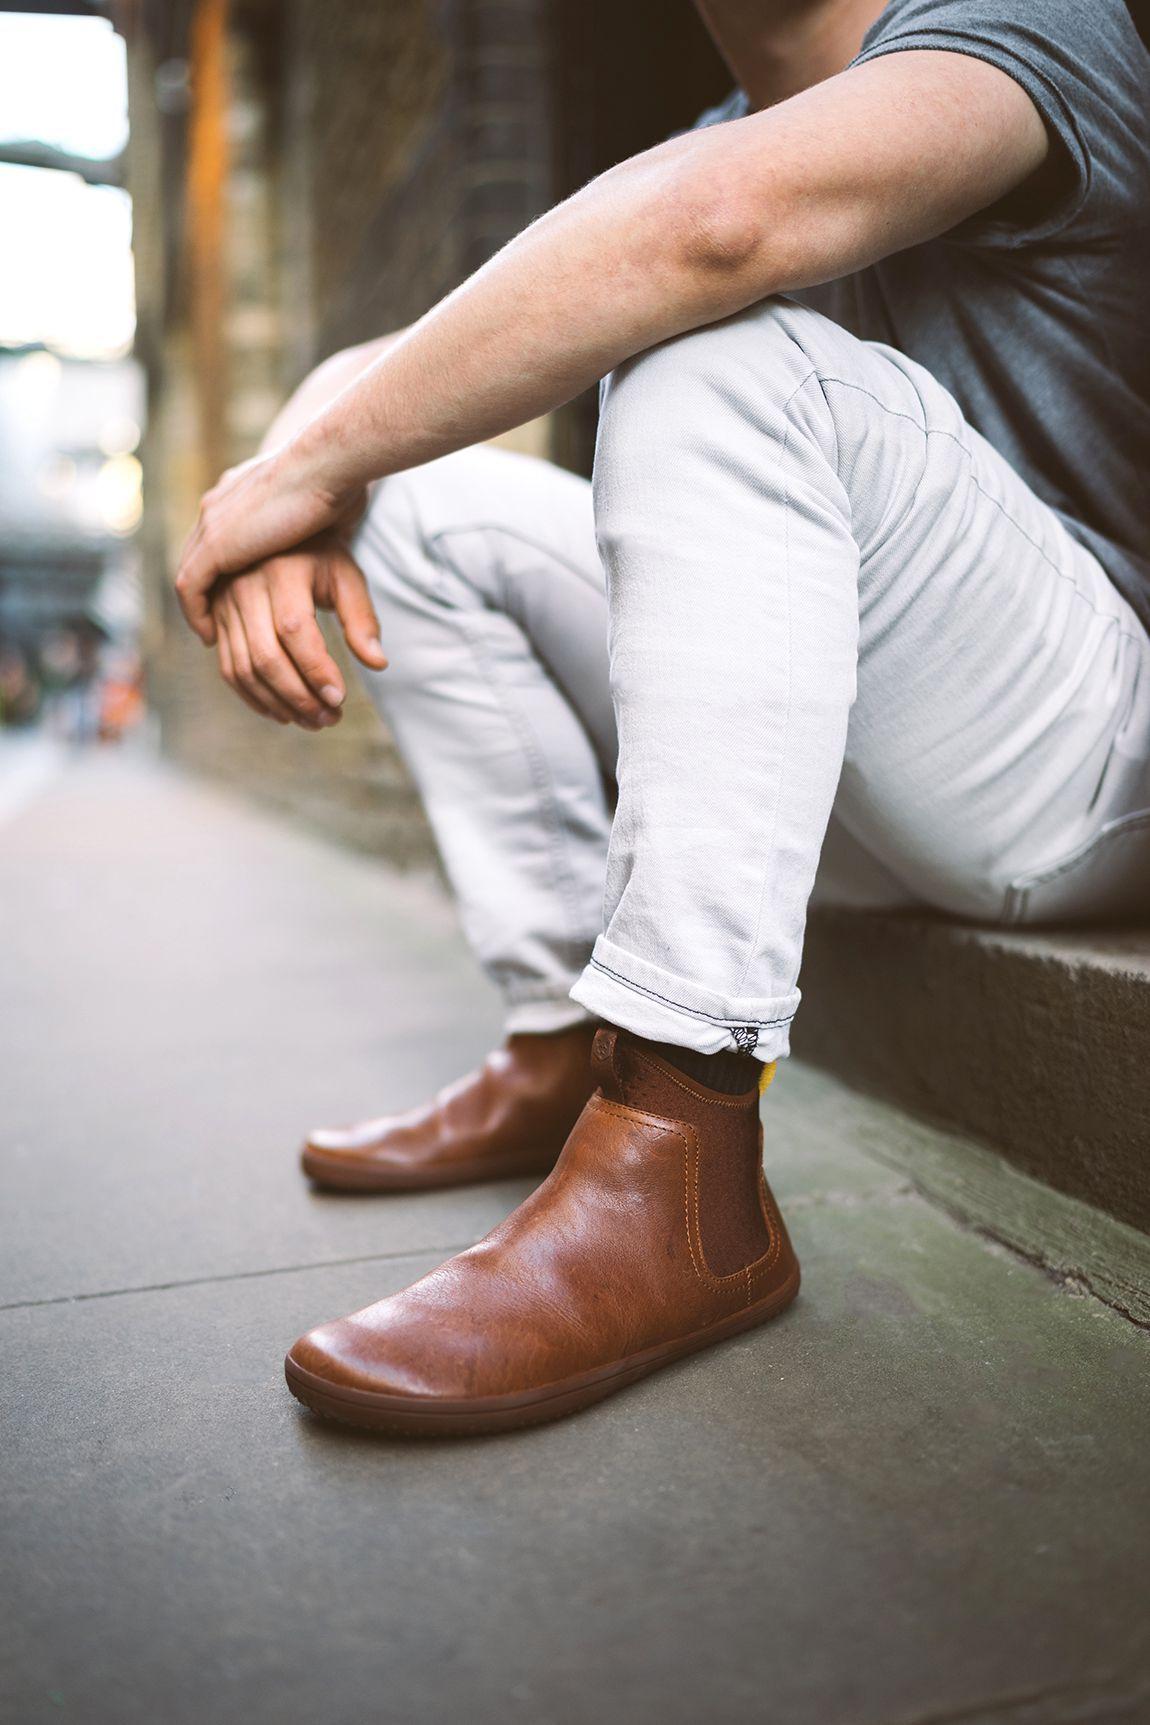 c4a9c1e52bfd1 Vivobarefoot Men s City Prooffor    Men s Minimalist Barefoot Neoprene    Leather Shoe